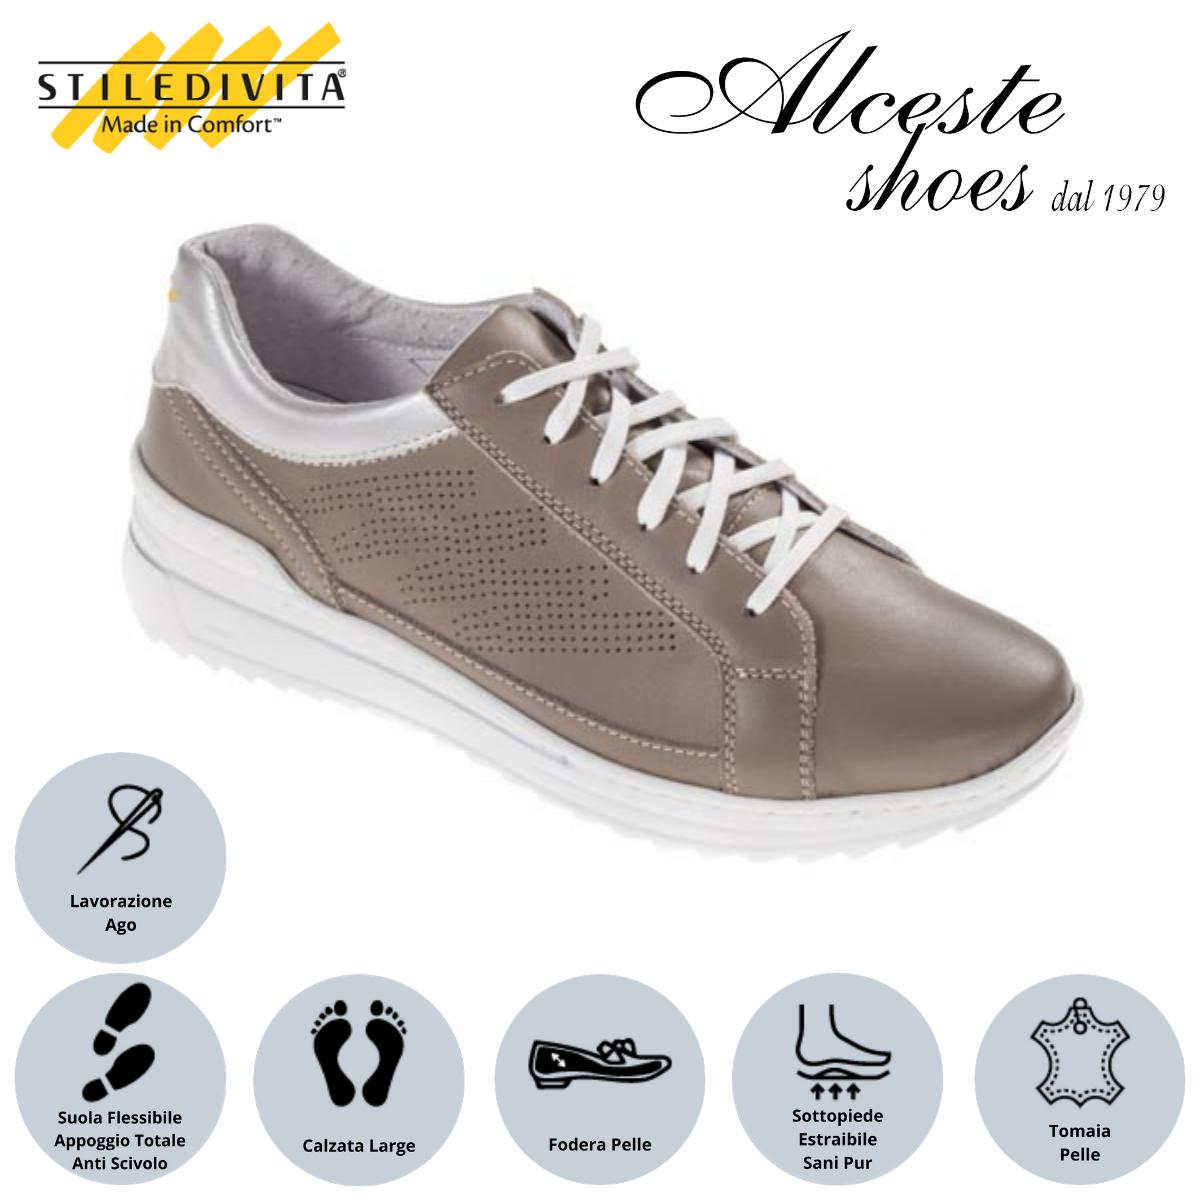 Sneakers Traforate Stiledivita Art. 7443 Pelle Taupe e Argento Alceste Shoes 24